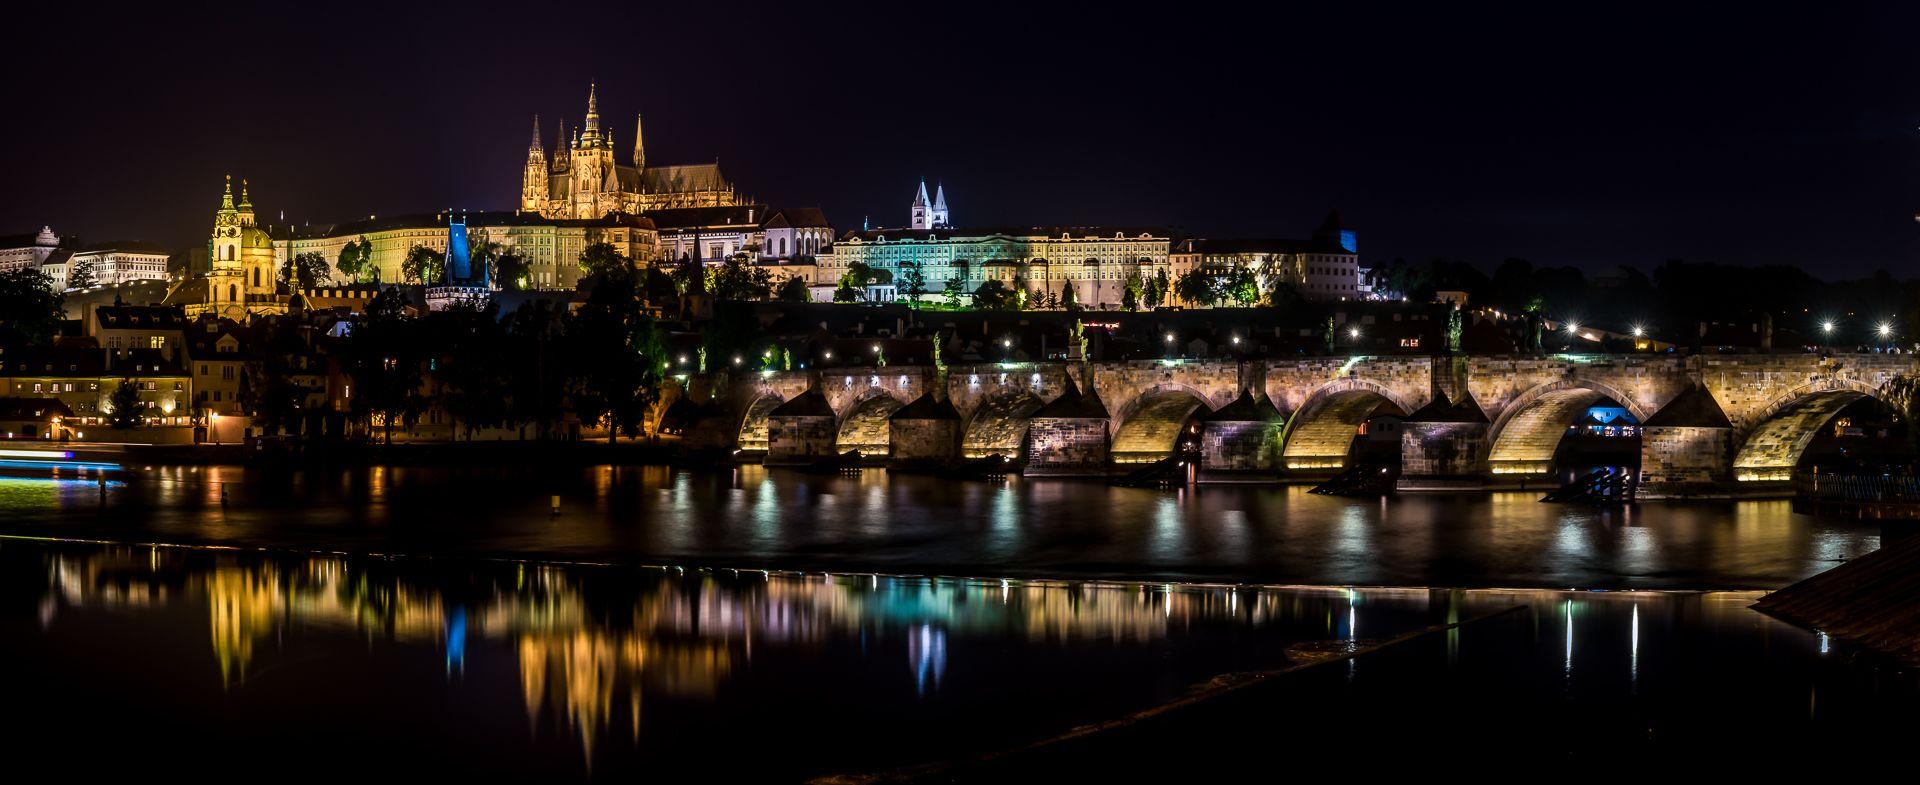 Daniel Poon – Prague Castle Night Pano Night View – 3rd